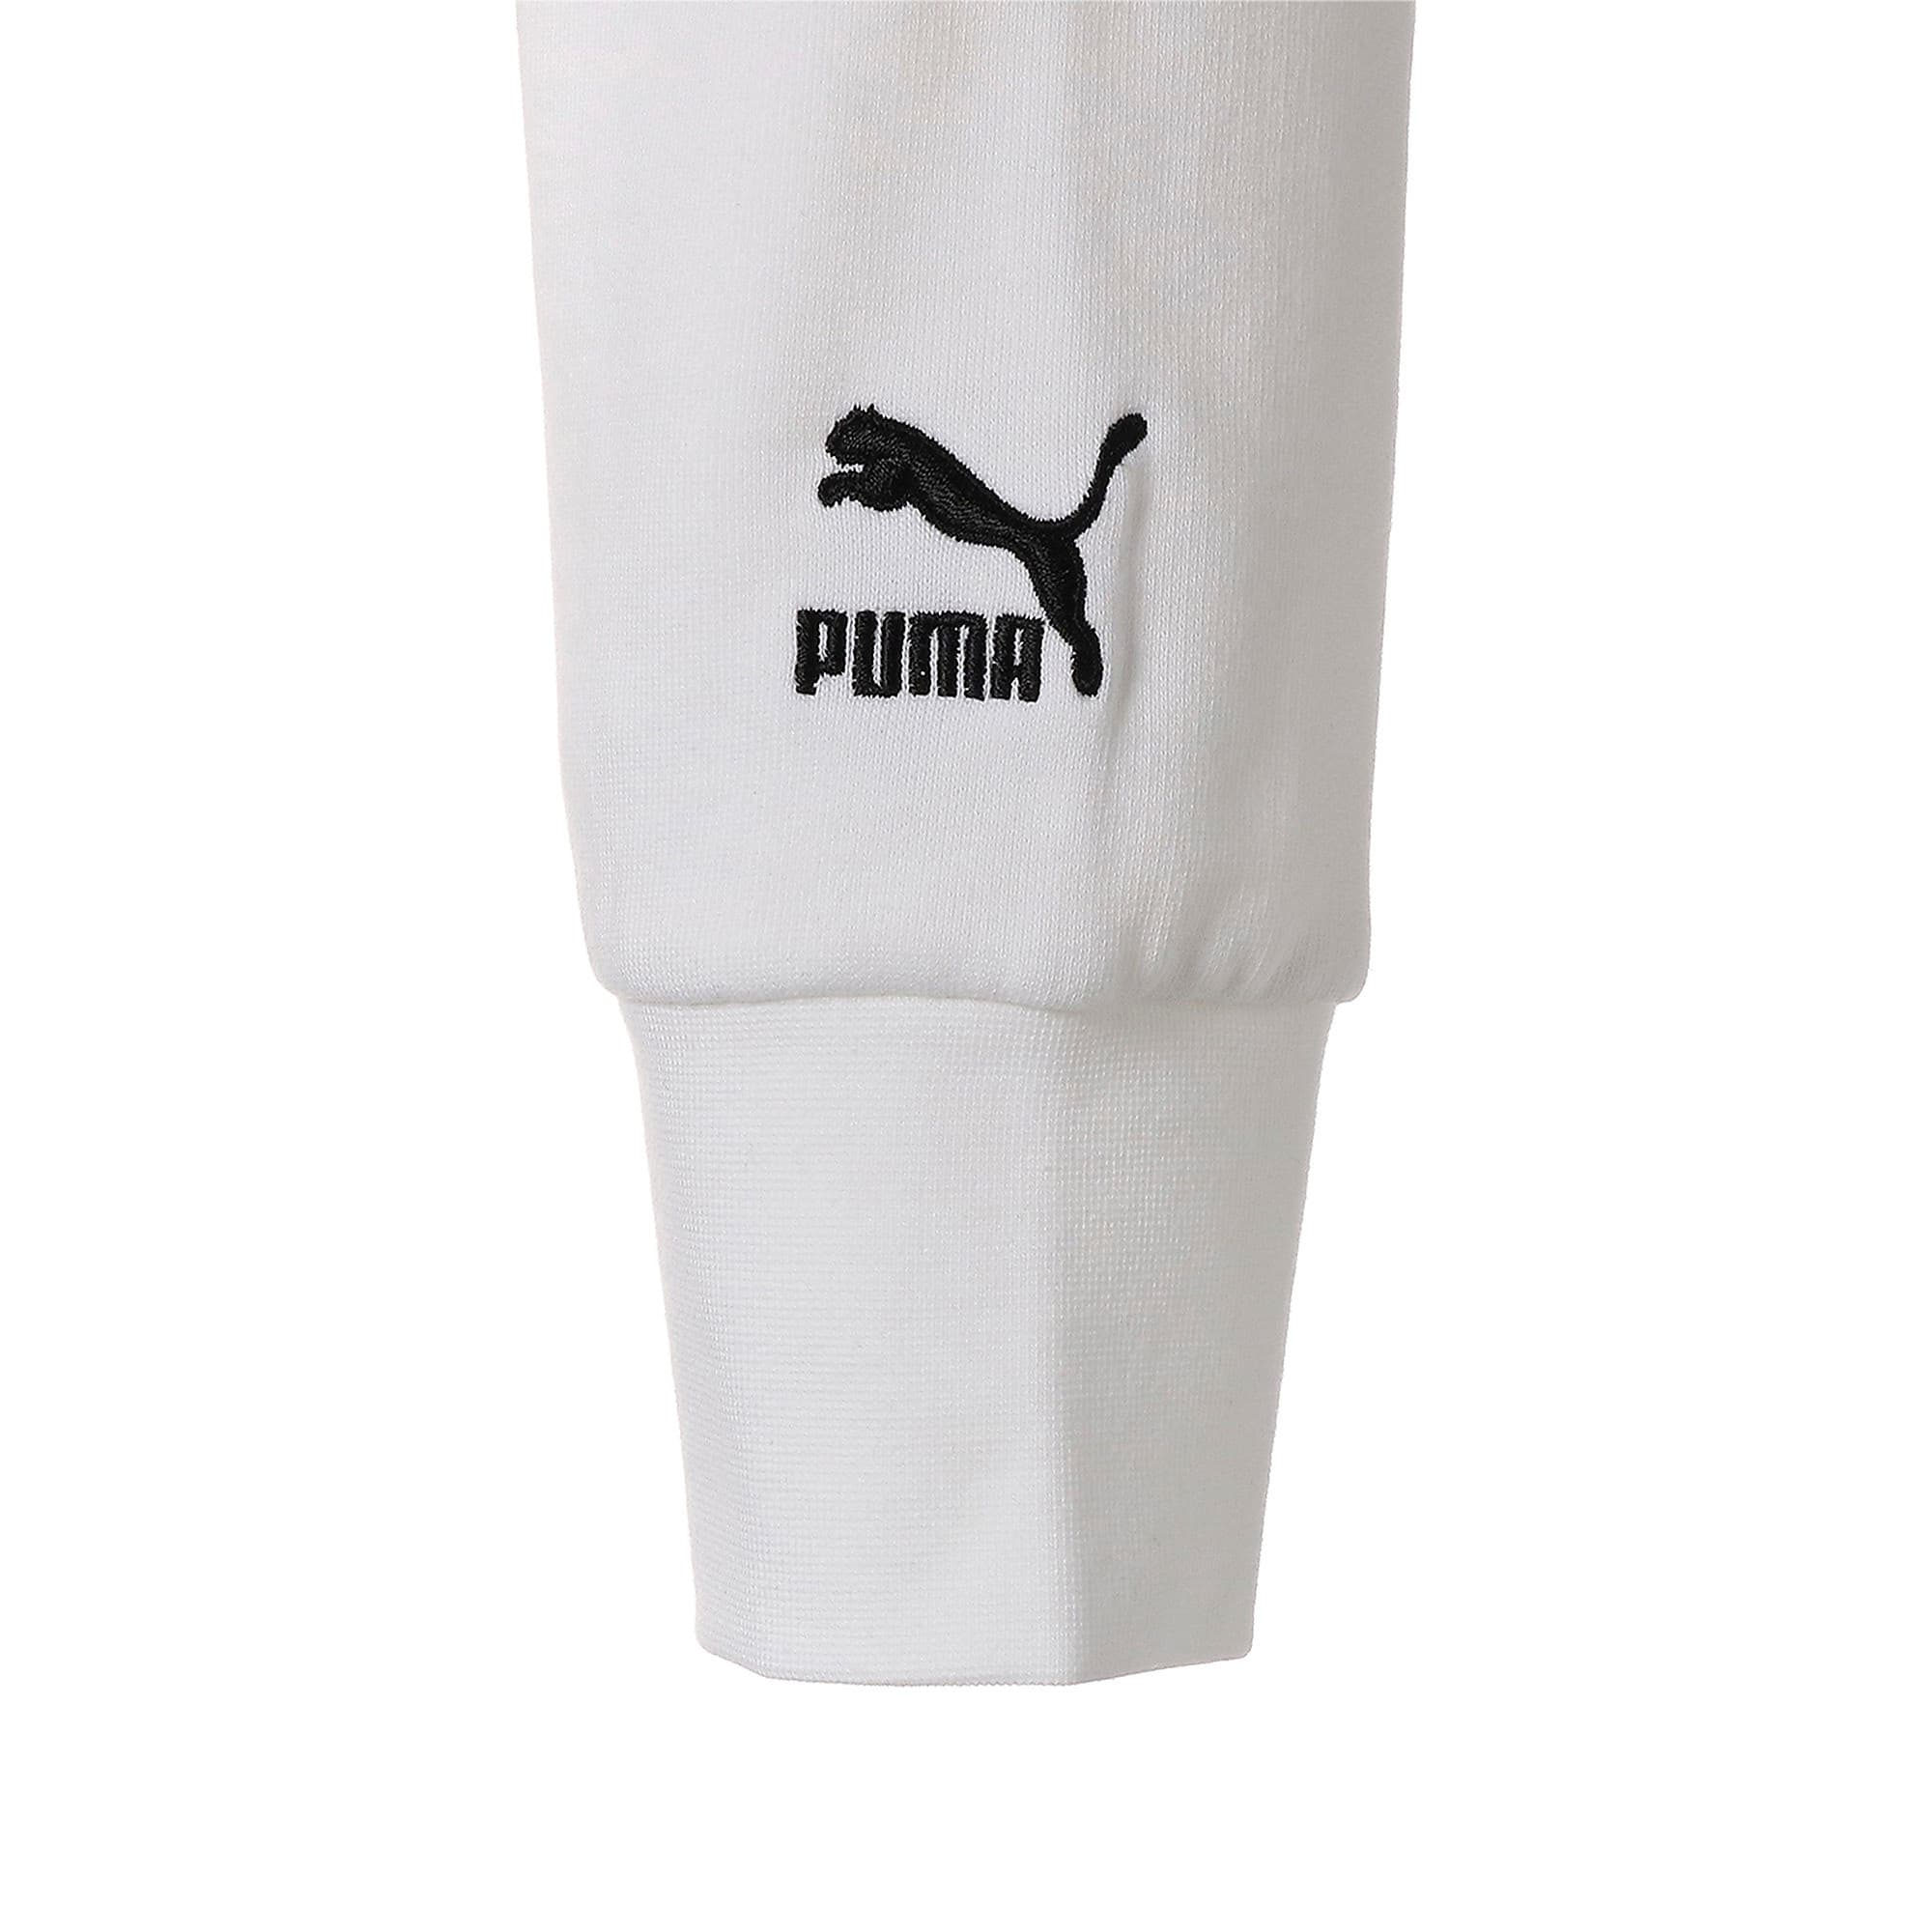 Thumbnail 6 of PUMA x TYAKASHA ウィメンズ タートルネック, Puma White, medium-JPN